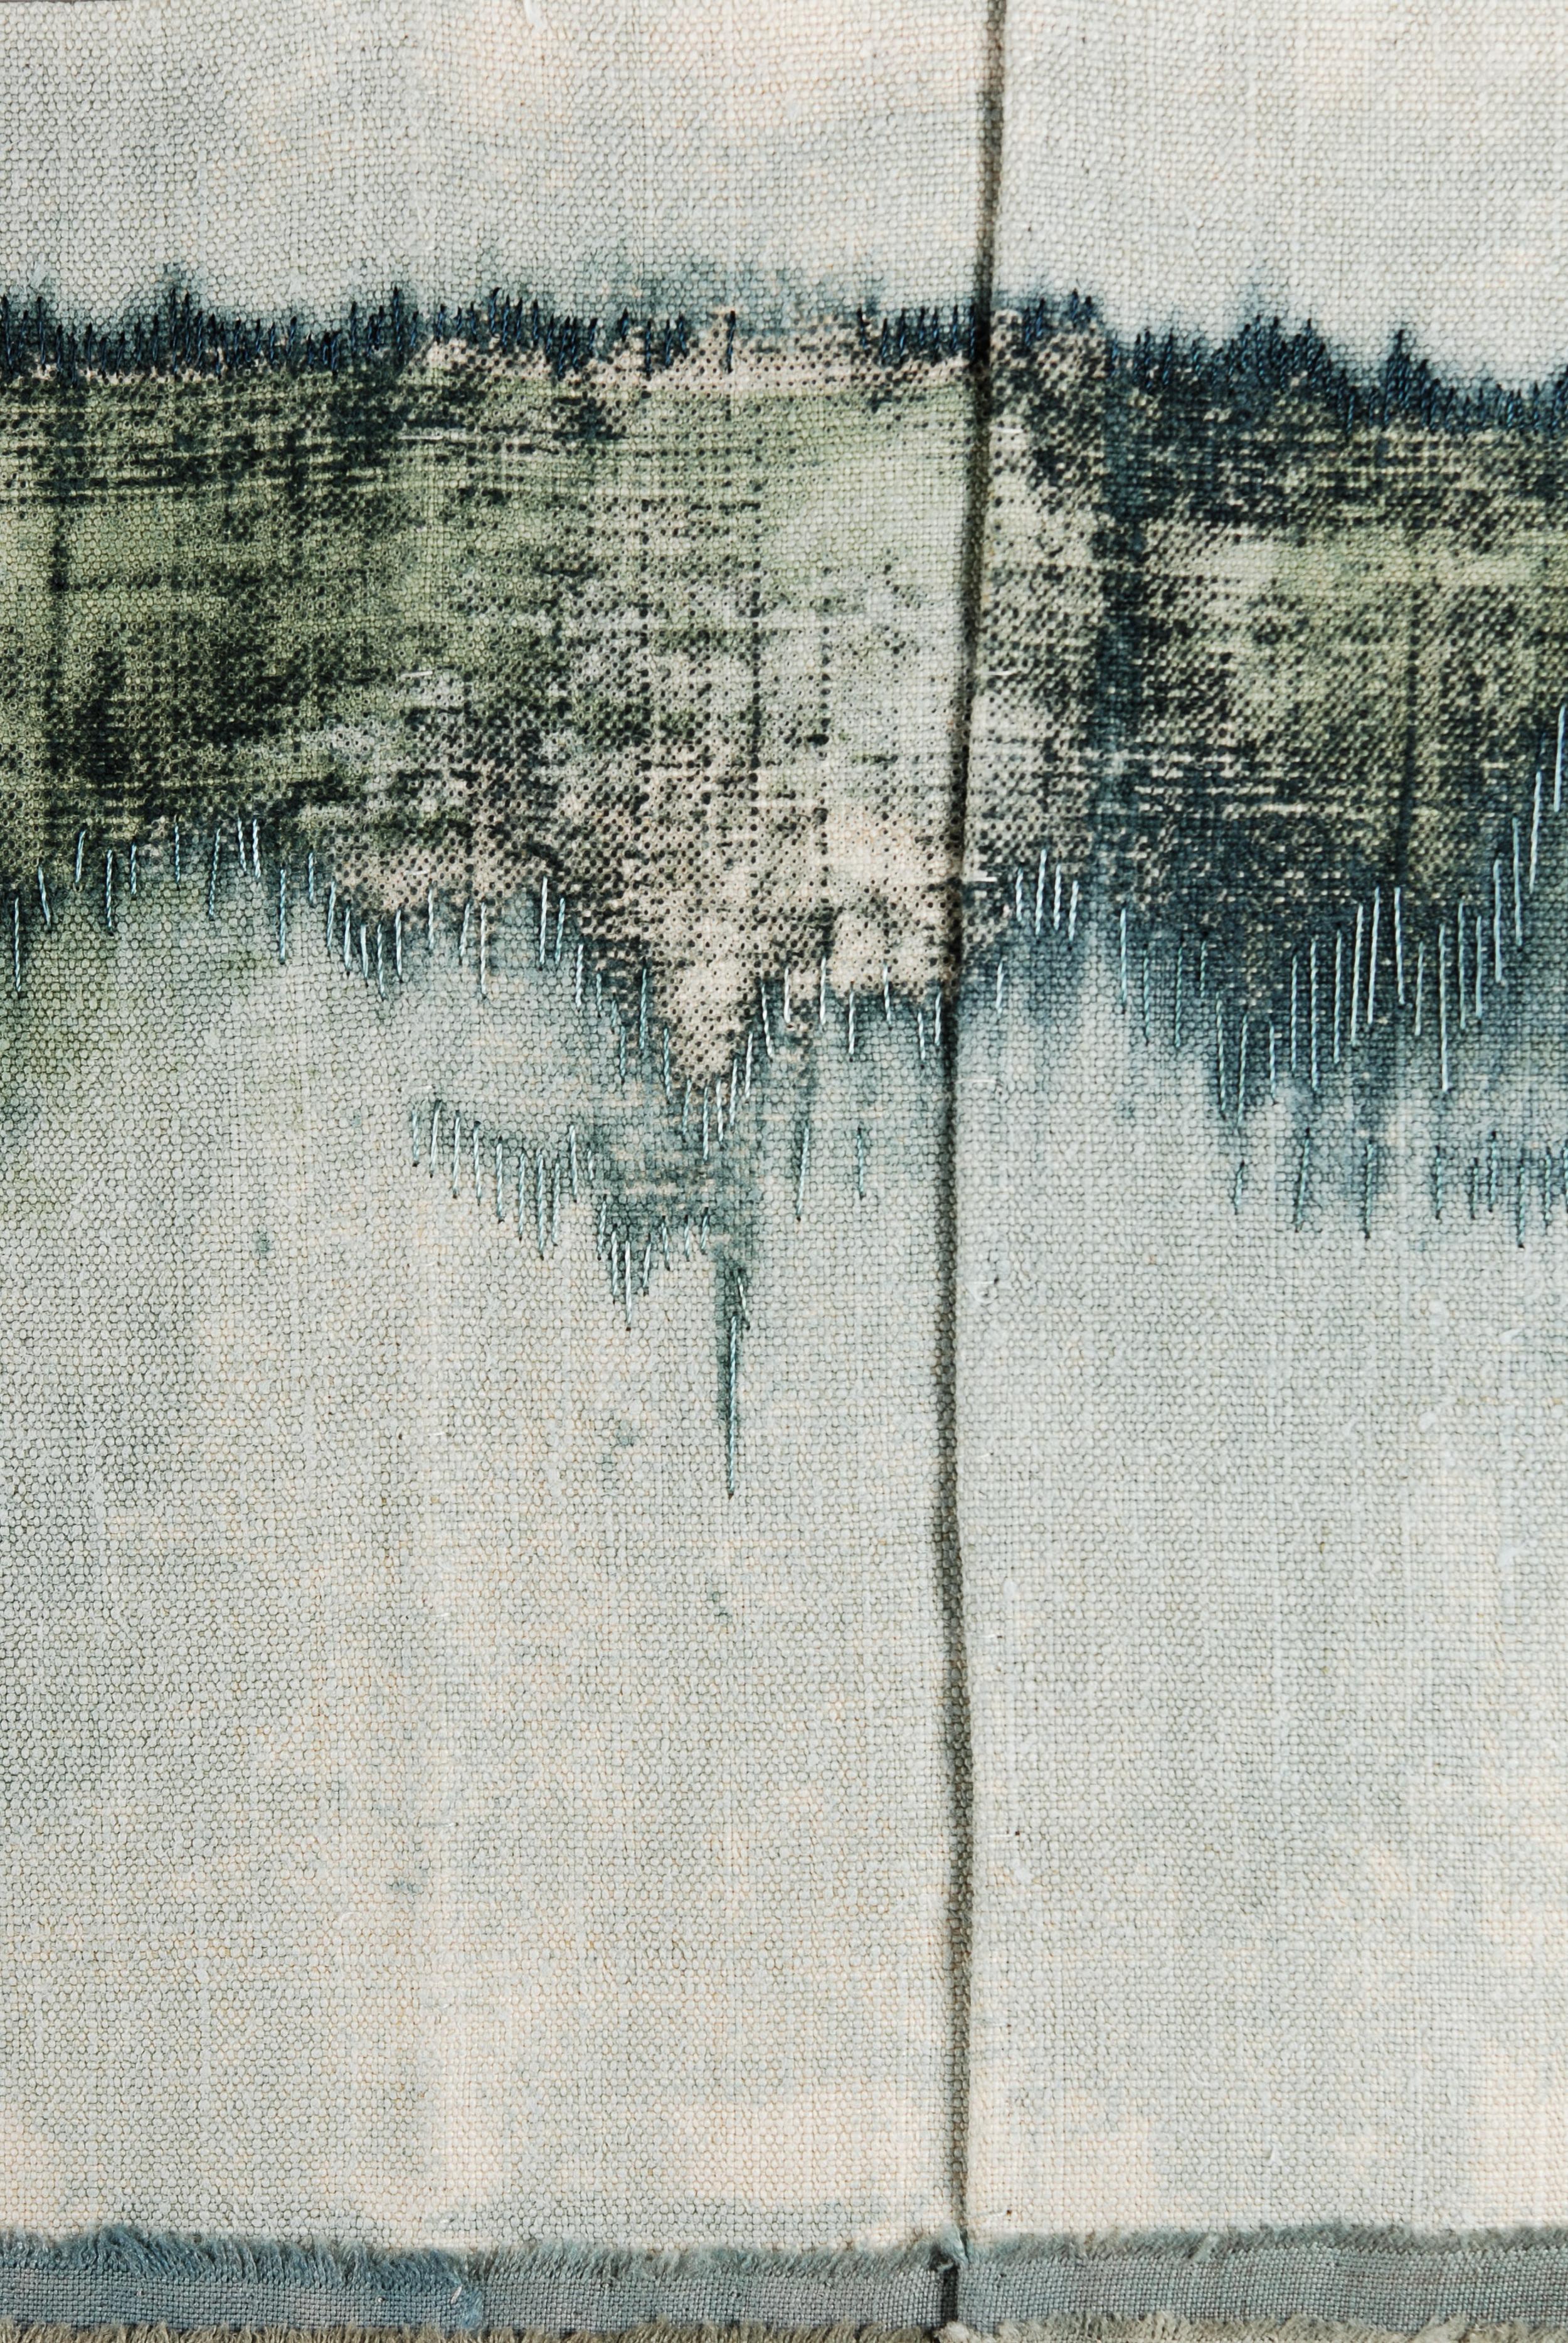 Between the lines 19 (detail)